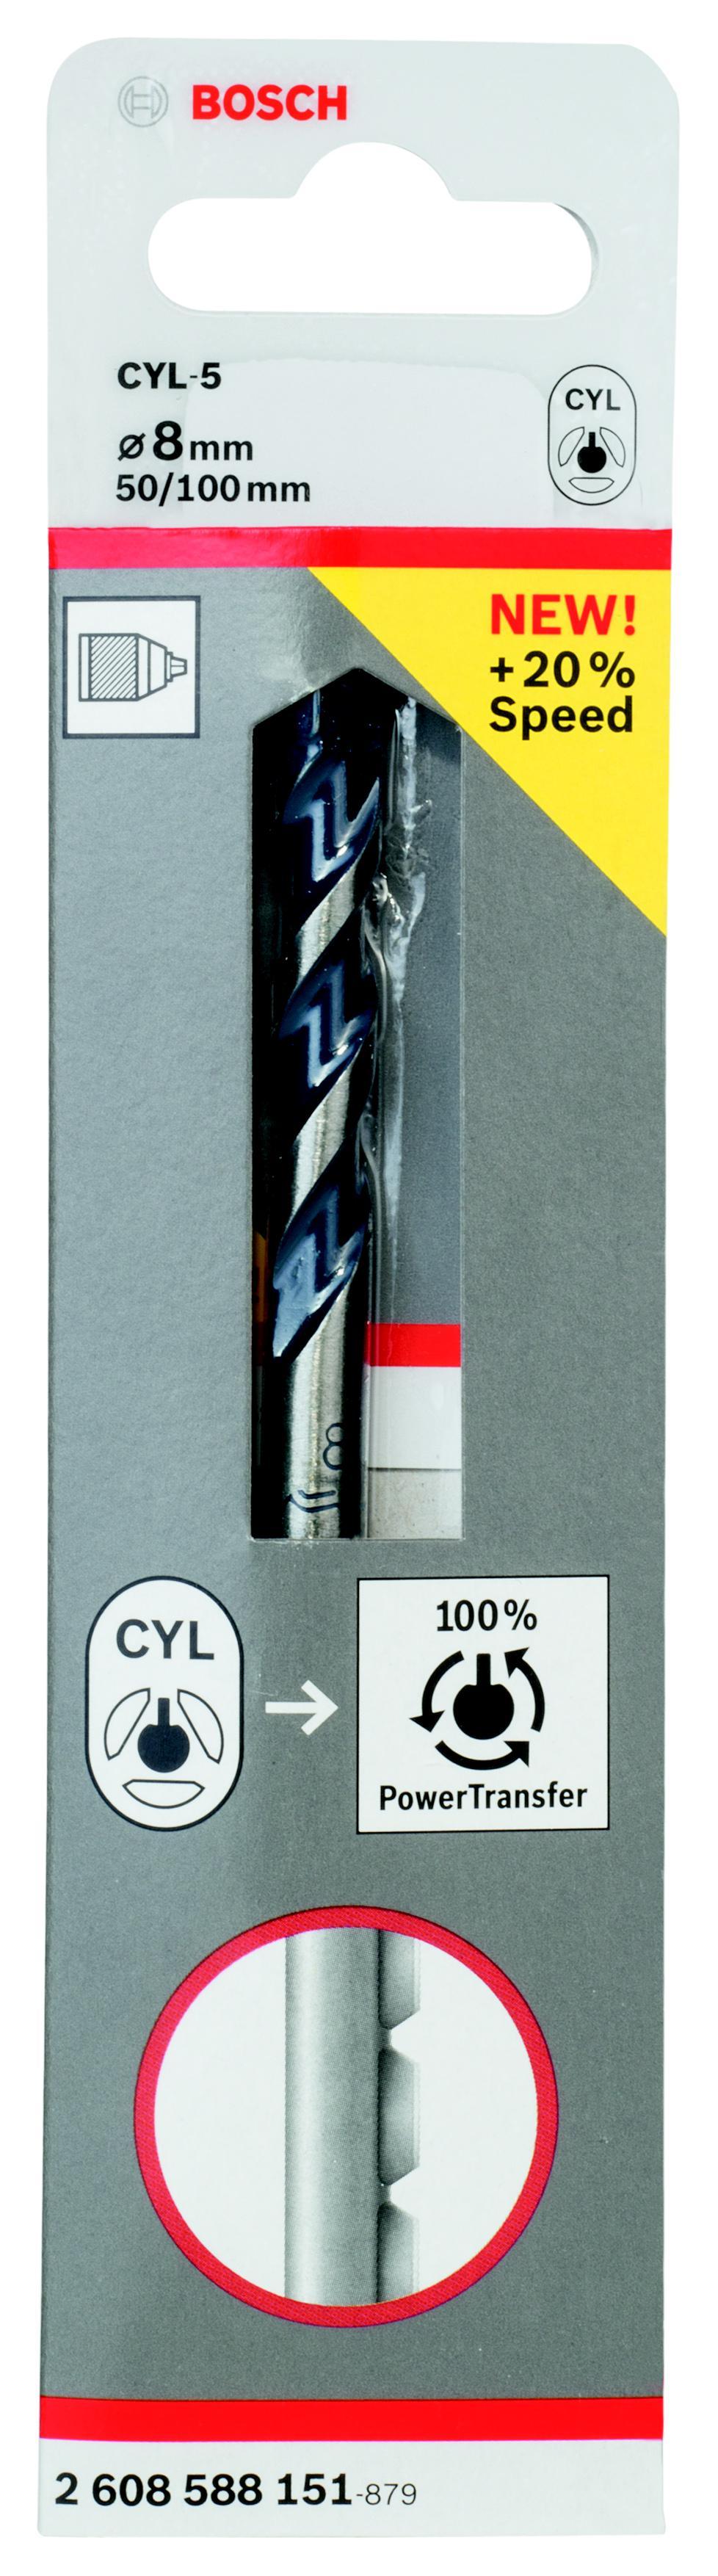 Сверло по камню Bosch Cyl-5 Ф8x50x100мм (2.608.588.151) сверло универсальное bosch cyl 9 multiconstr